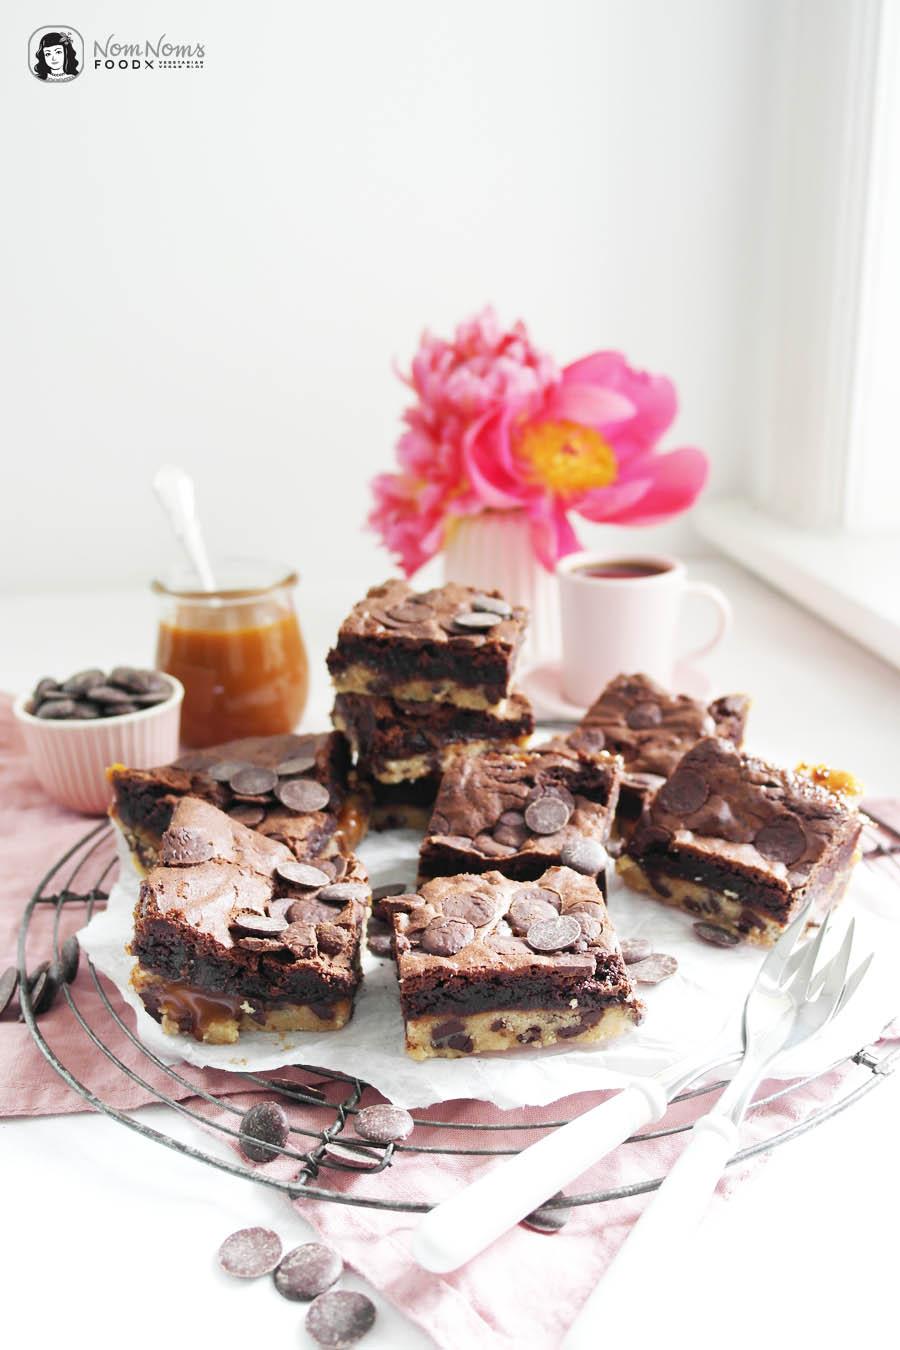 Brownie-Cookies mit Salzkaramell, Salted Caramel Brookies oder auch Slutty Brownies